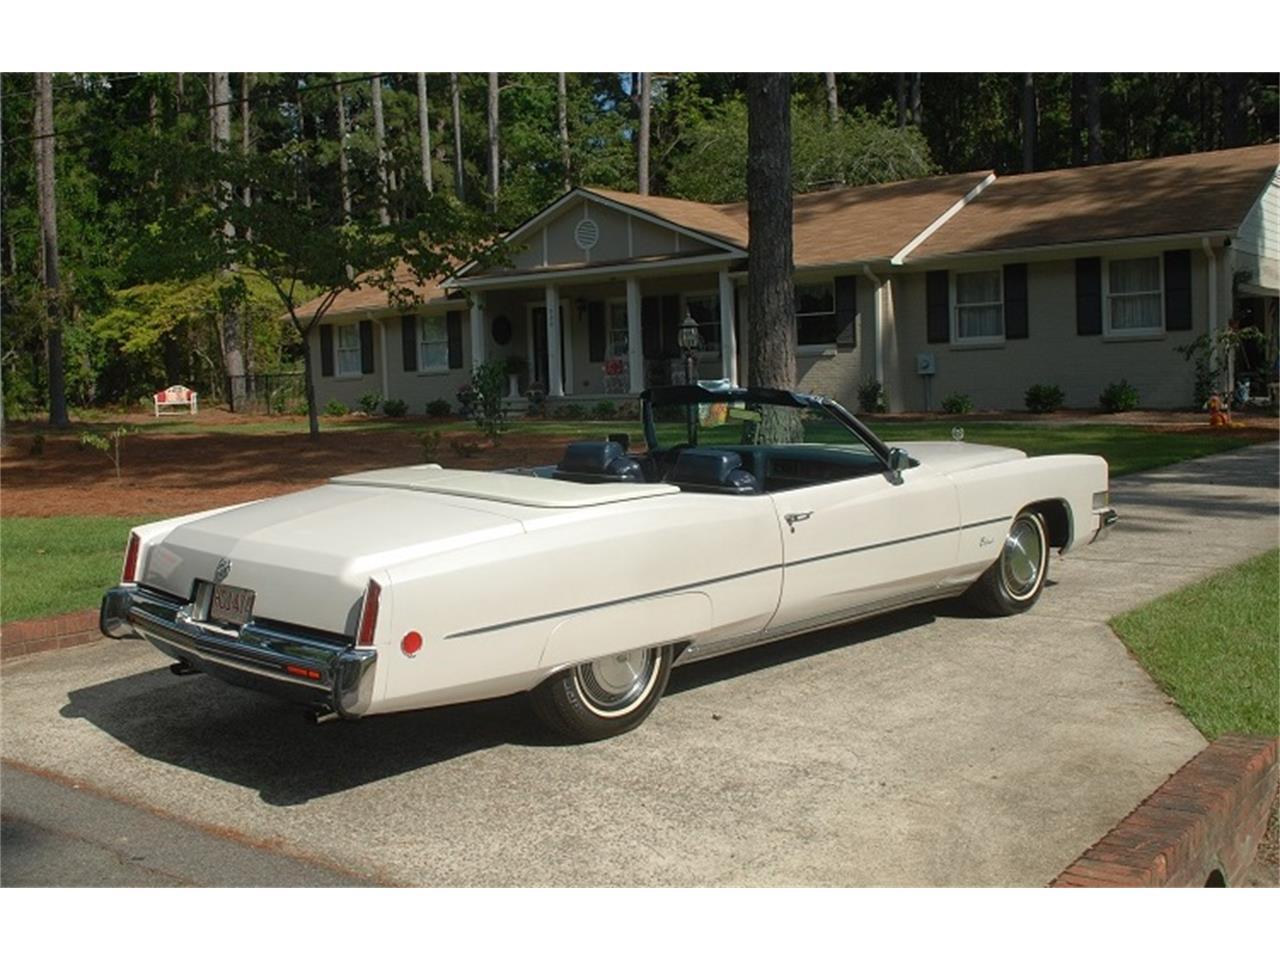 For Sale 1973 Cadillac Eldorado In Aberdeen North Carolina